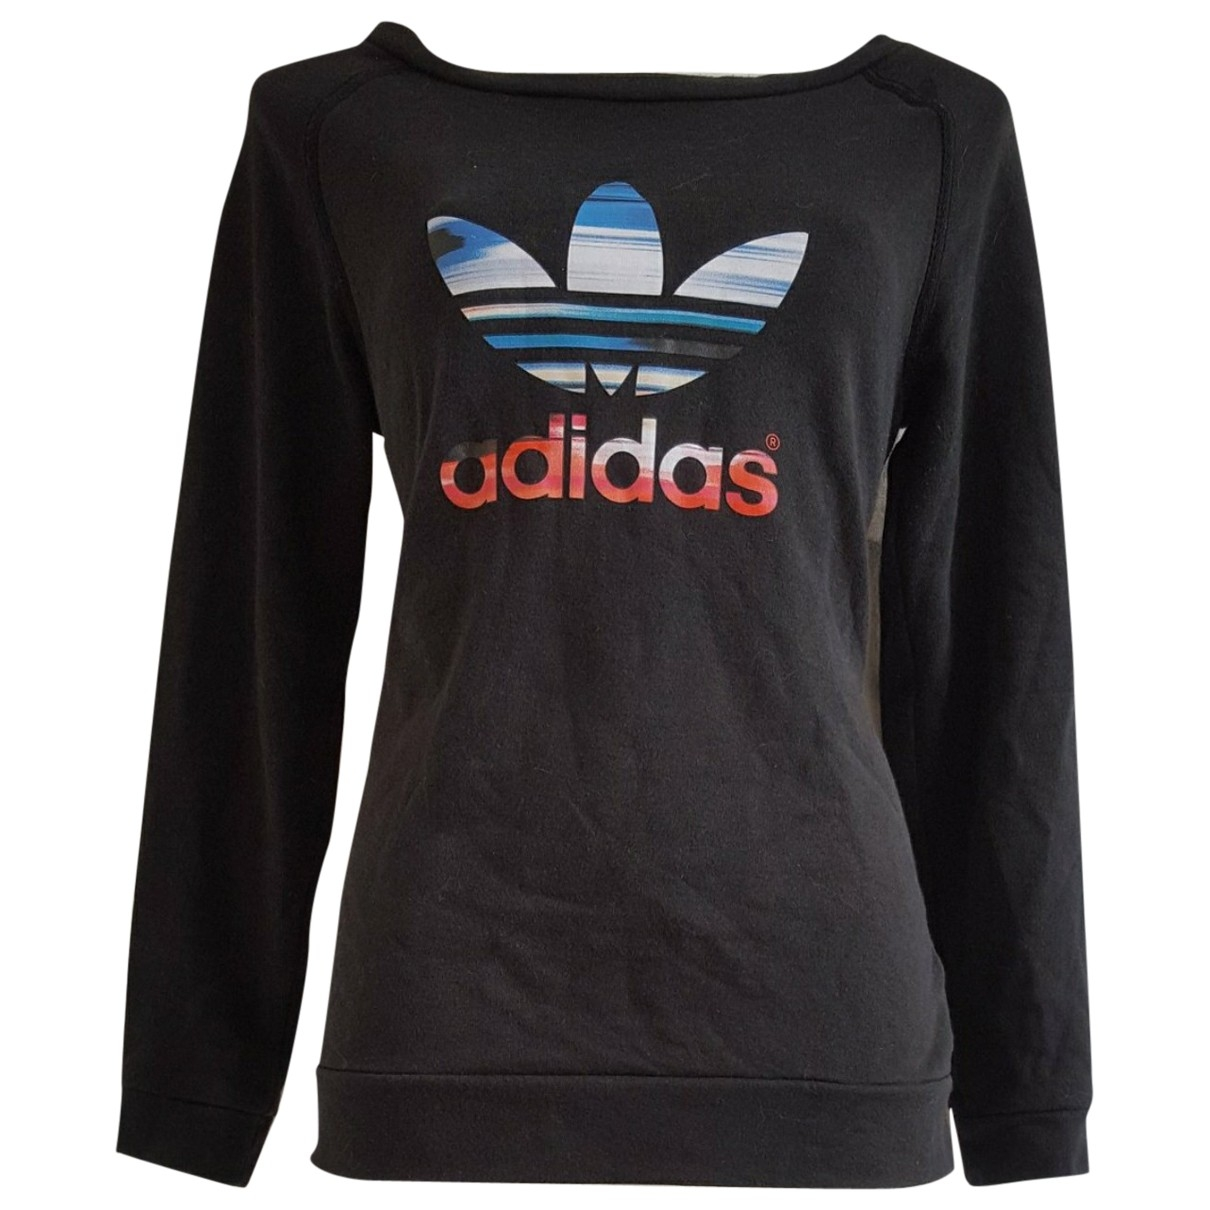 Adidas \N Black Knitwear for Women S International